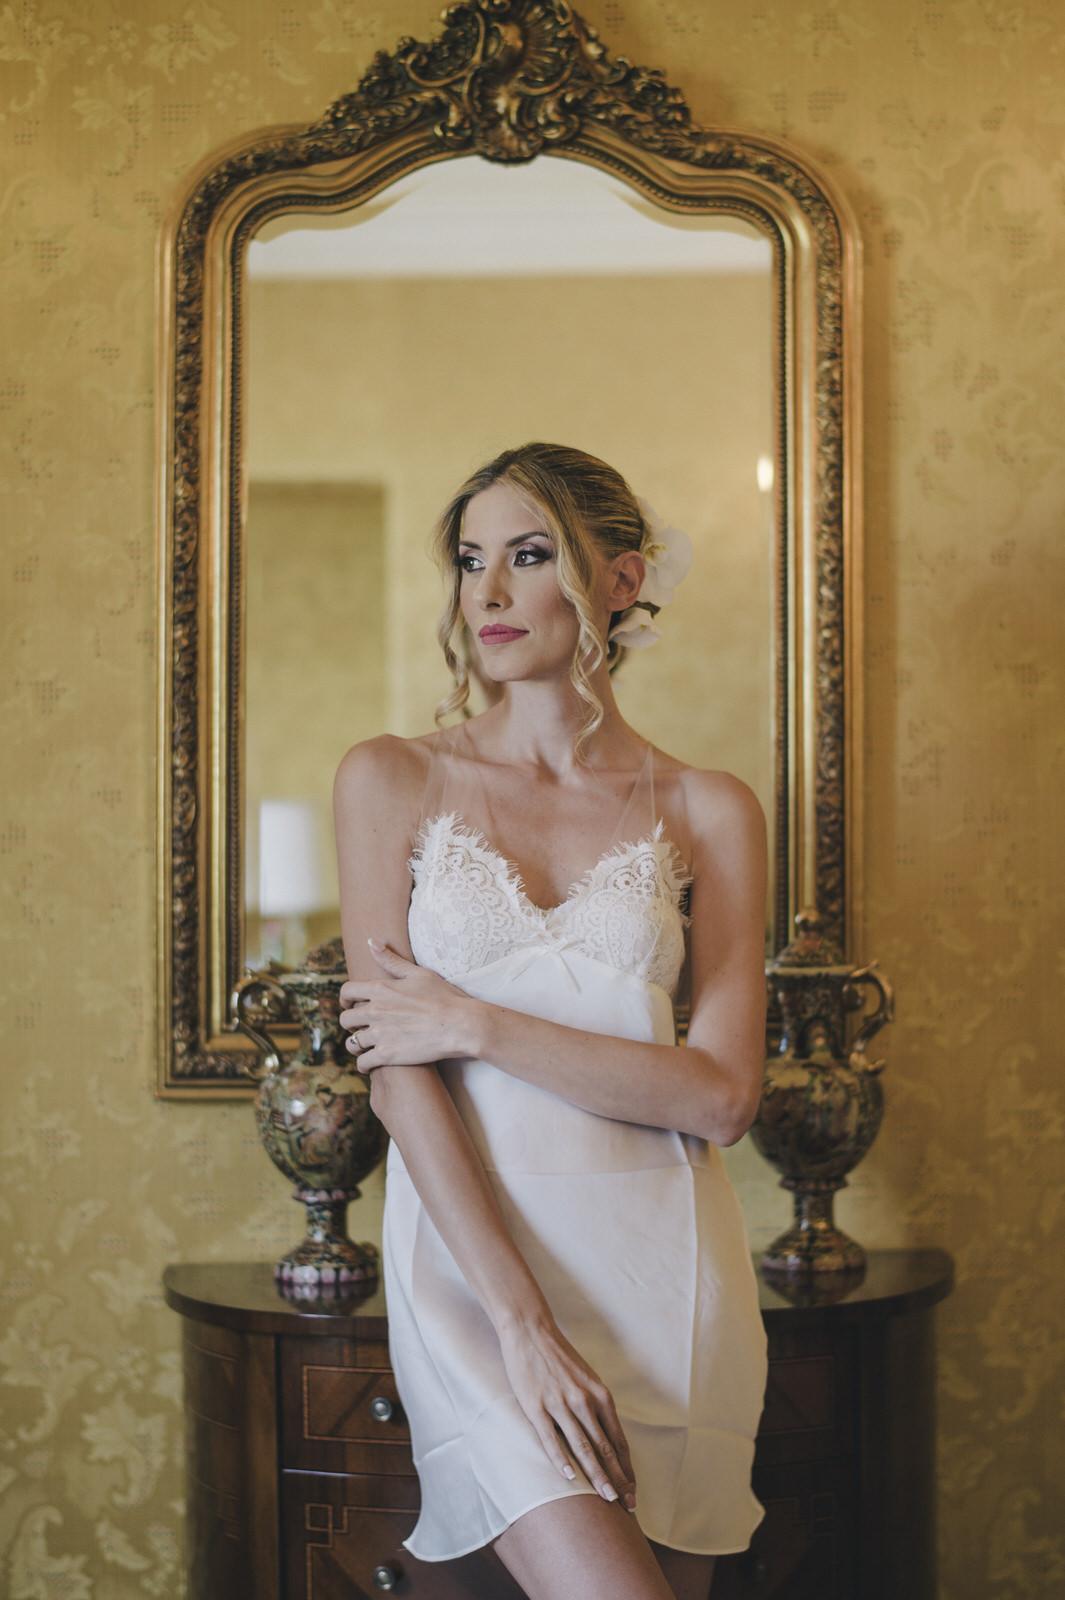 bride's portrait with a mirror behind